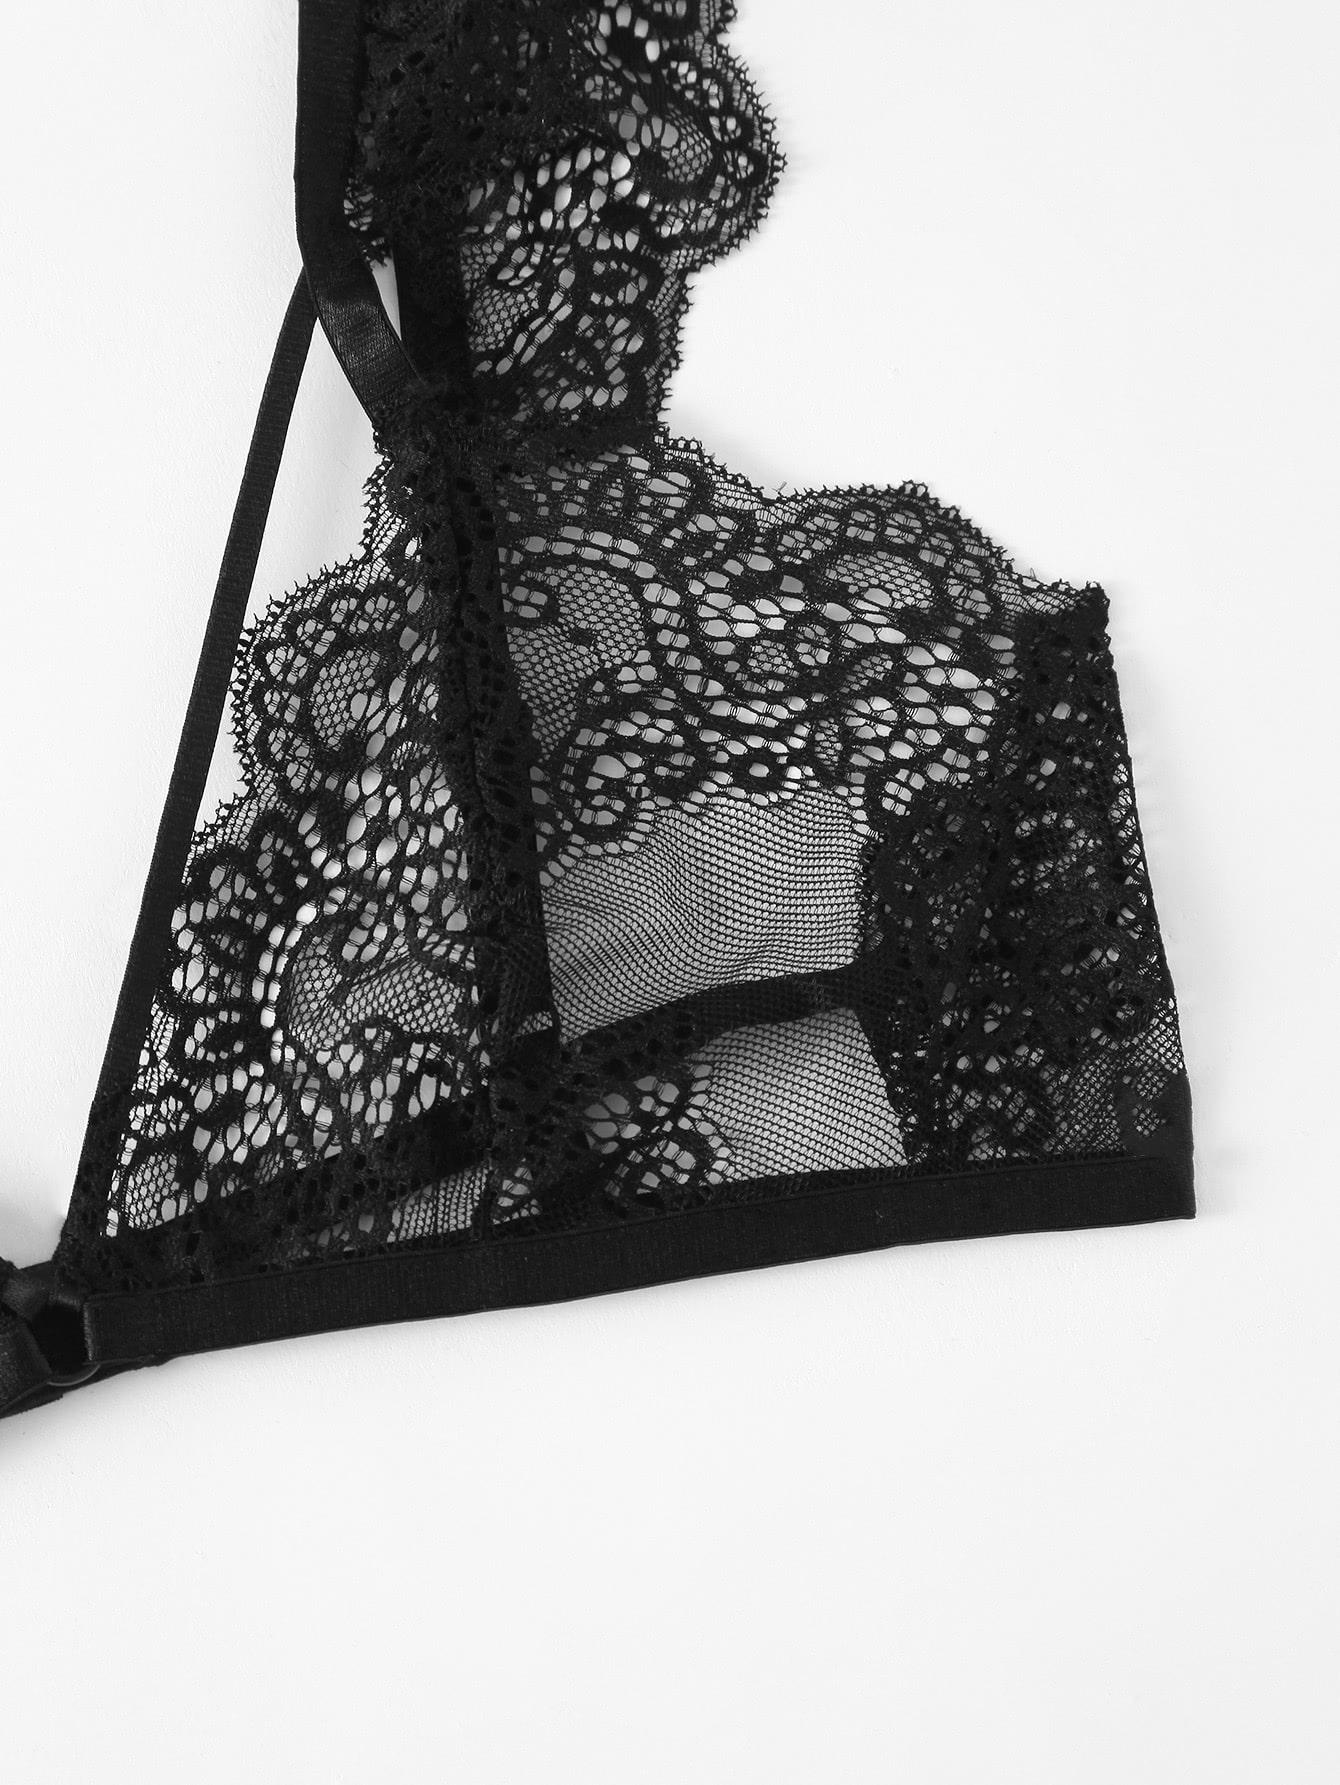 Adjustable Strap Lace Bralette